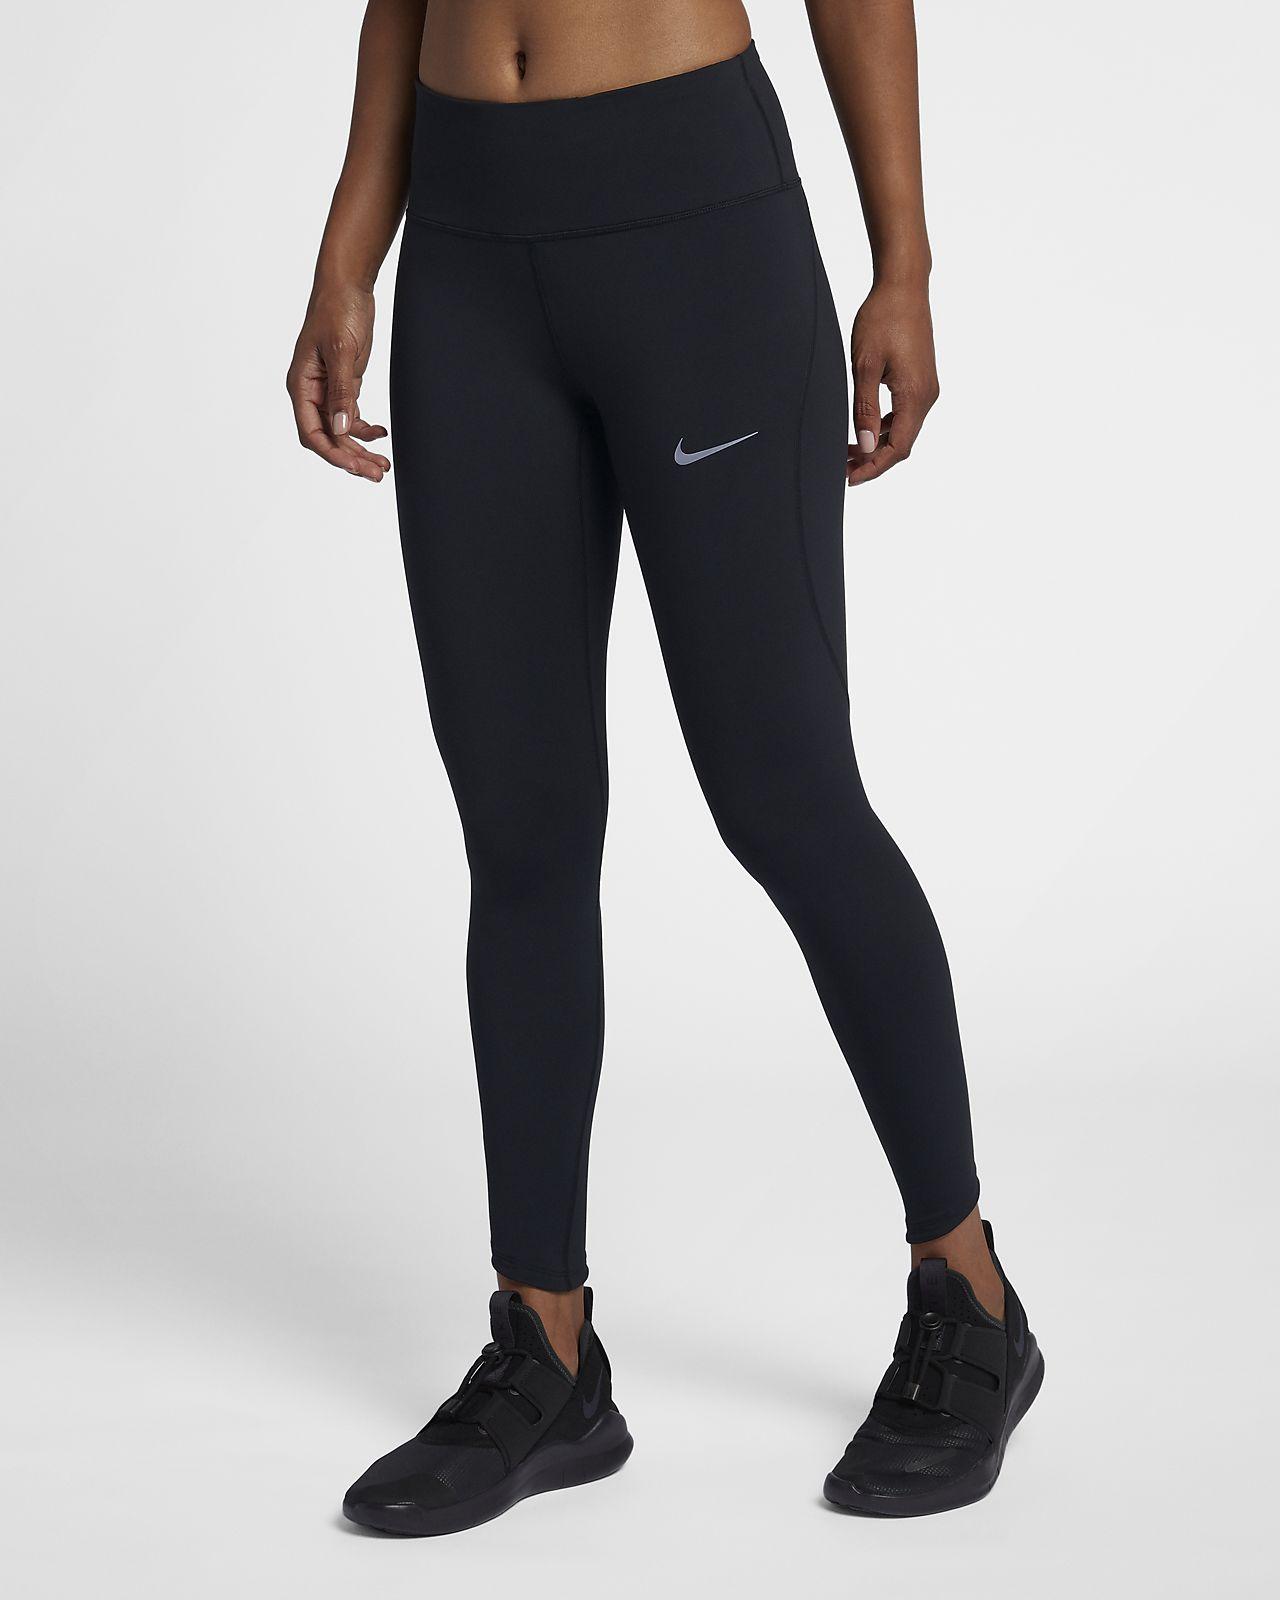 0e16f236377d Γυναικείο ψηλόμεσο κολάν 7 8 για τρέξιμο Nike Epic Lux. Nike.com GR